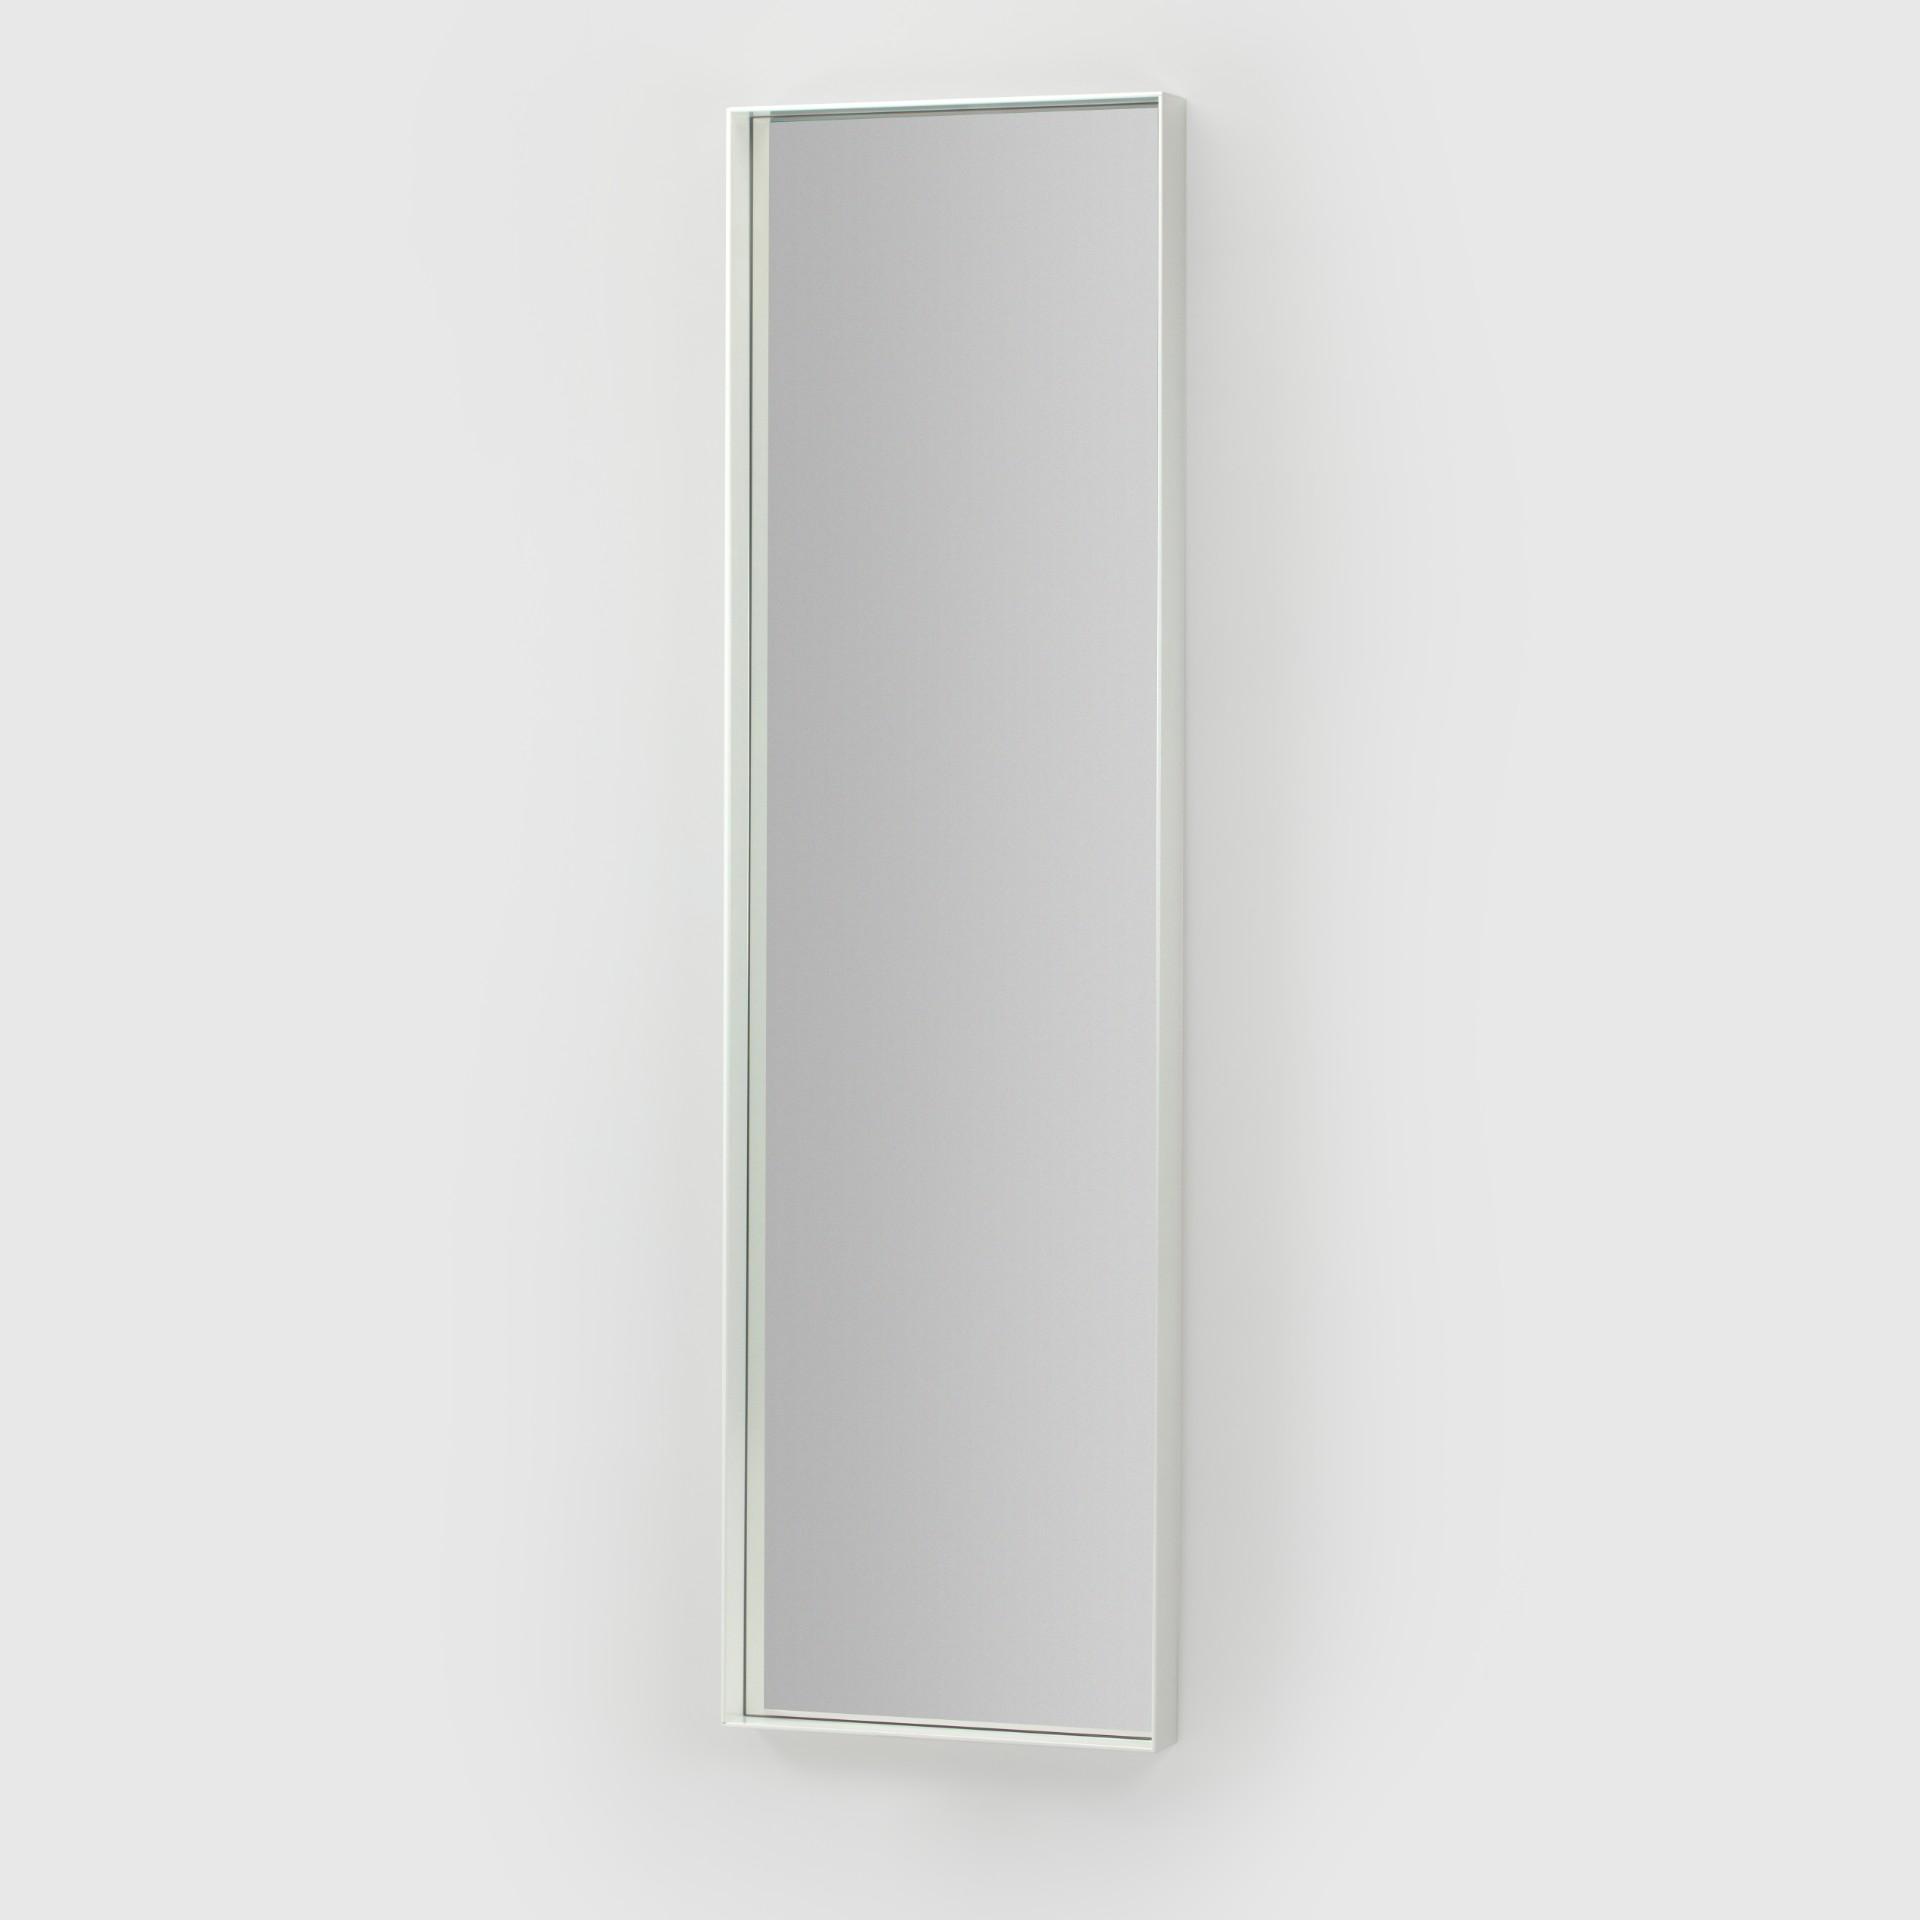 Spegel_7_vit